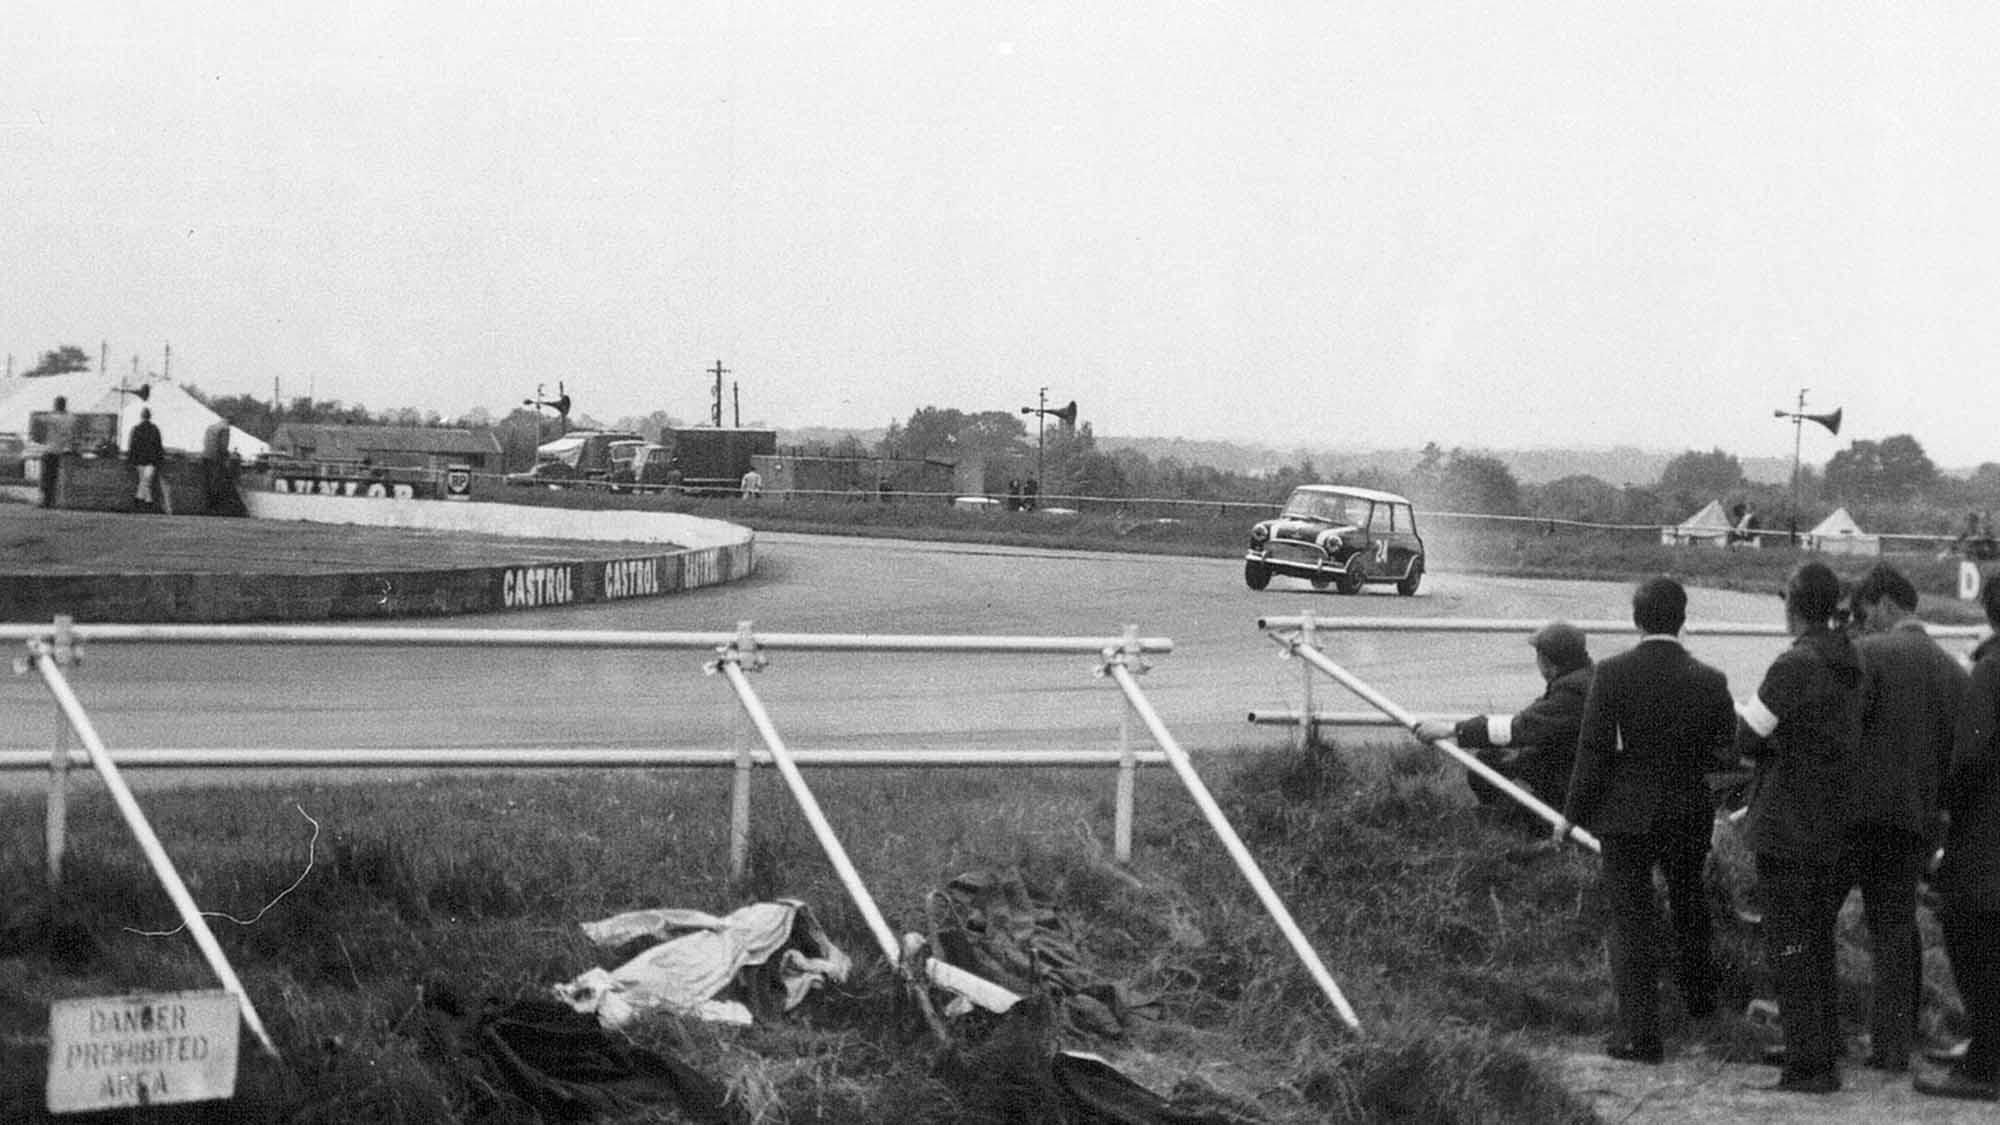 Mini Cooper at Copse Corner during the 1965 British Grand Prix meeting at Silverstone